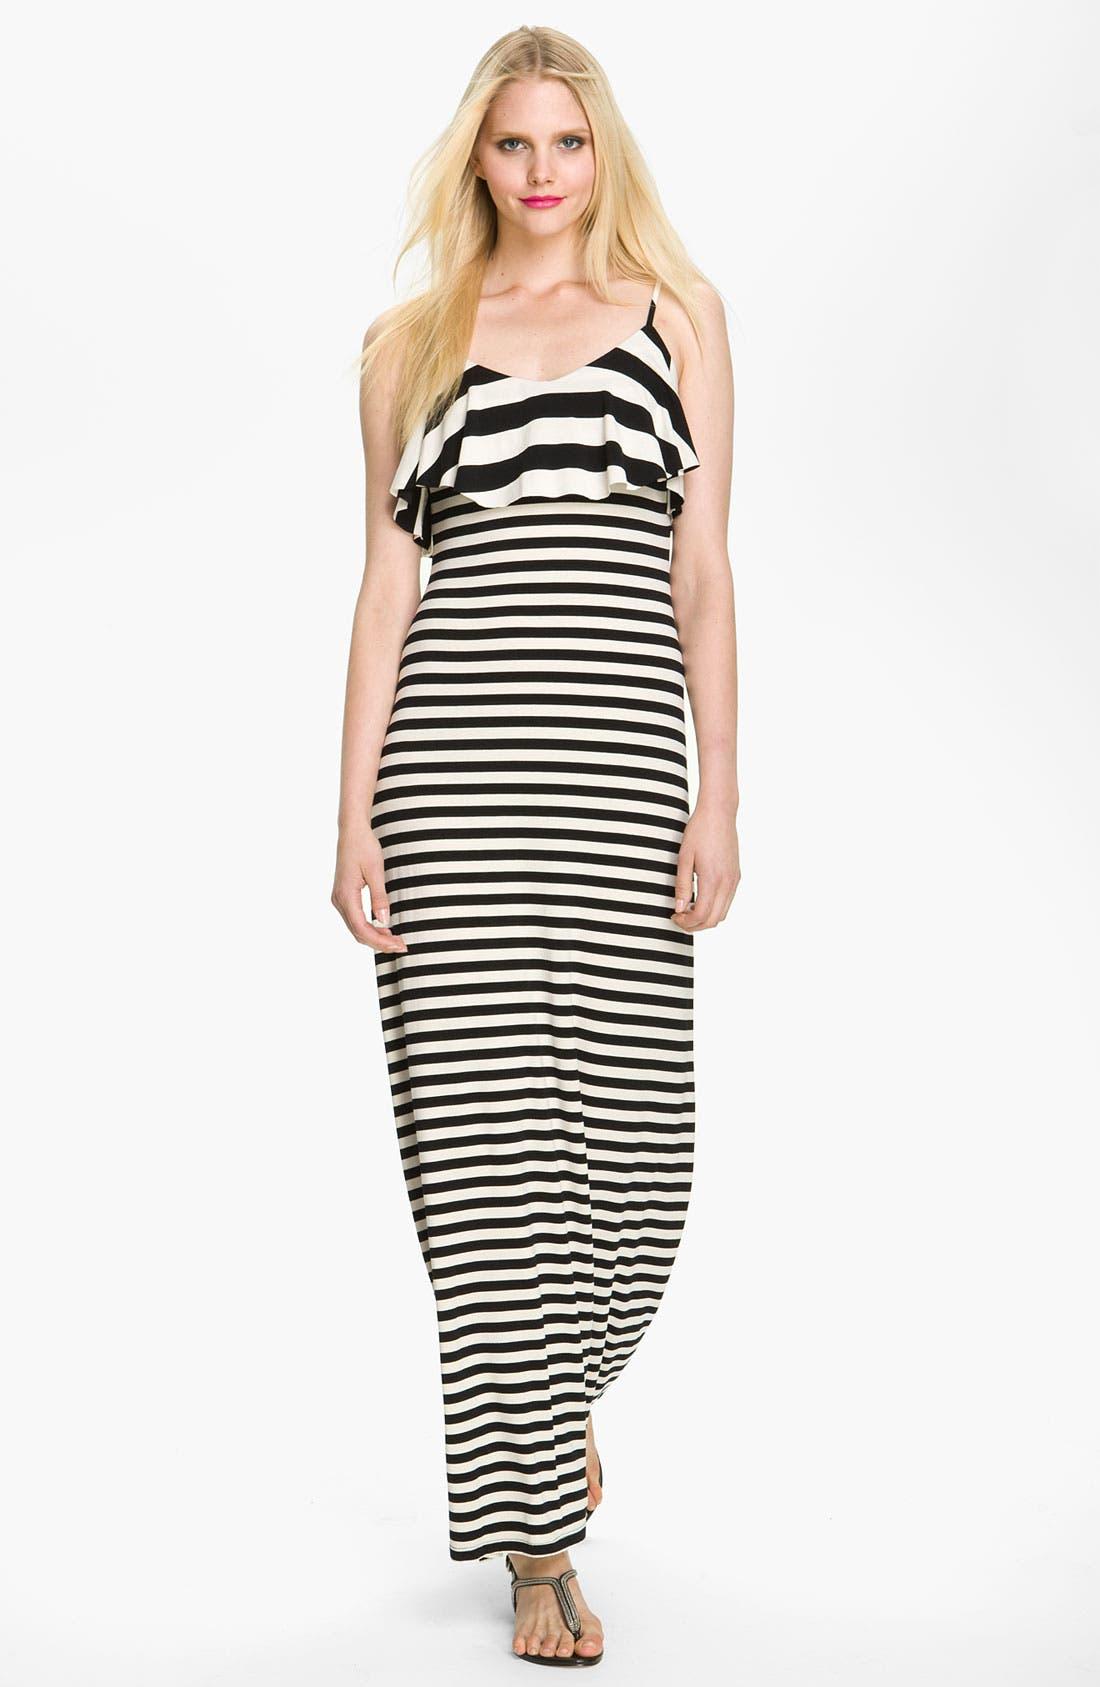 Main Image - Seamline Cynthia Steffe 'Leslie' Print Ruffle Front Maxi Dress